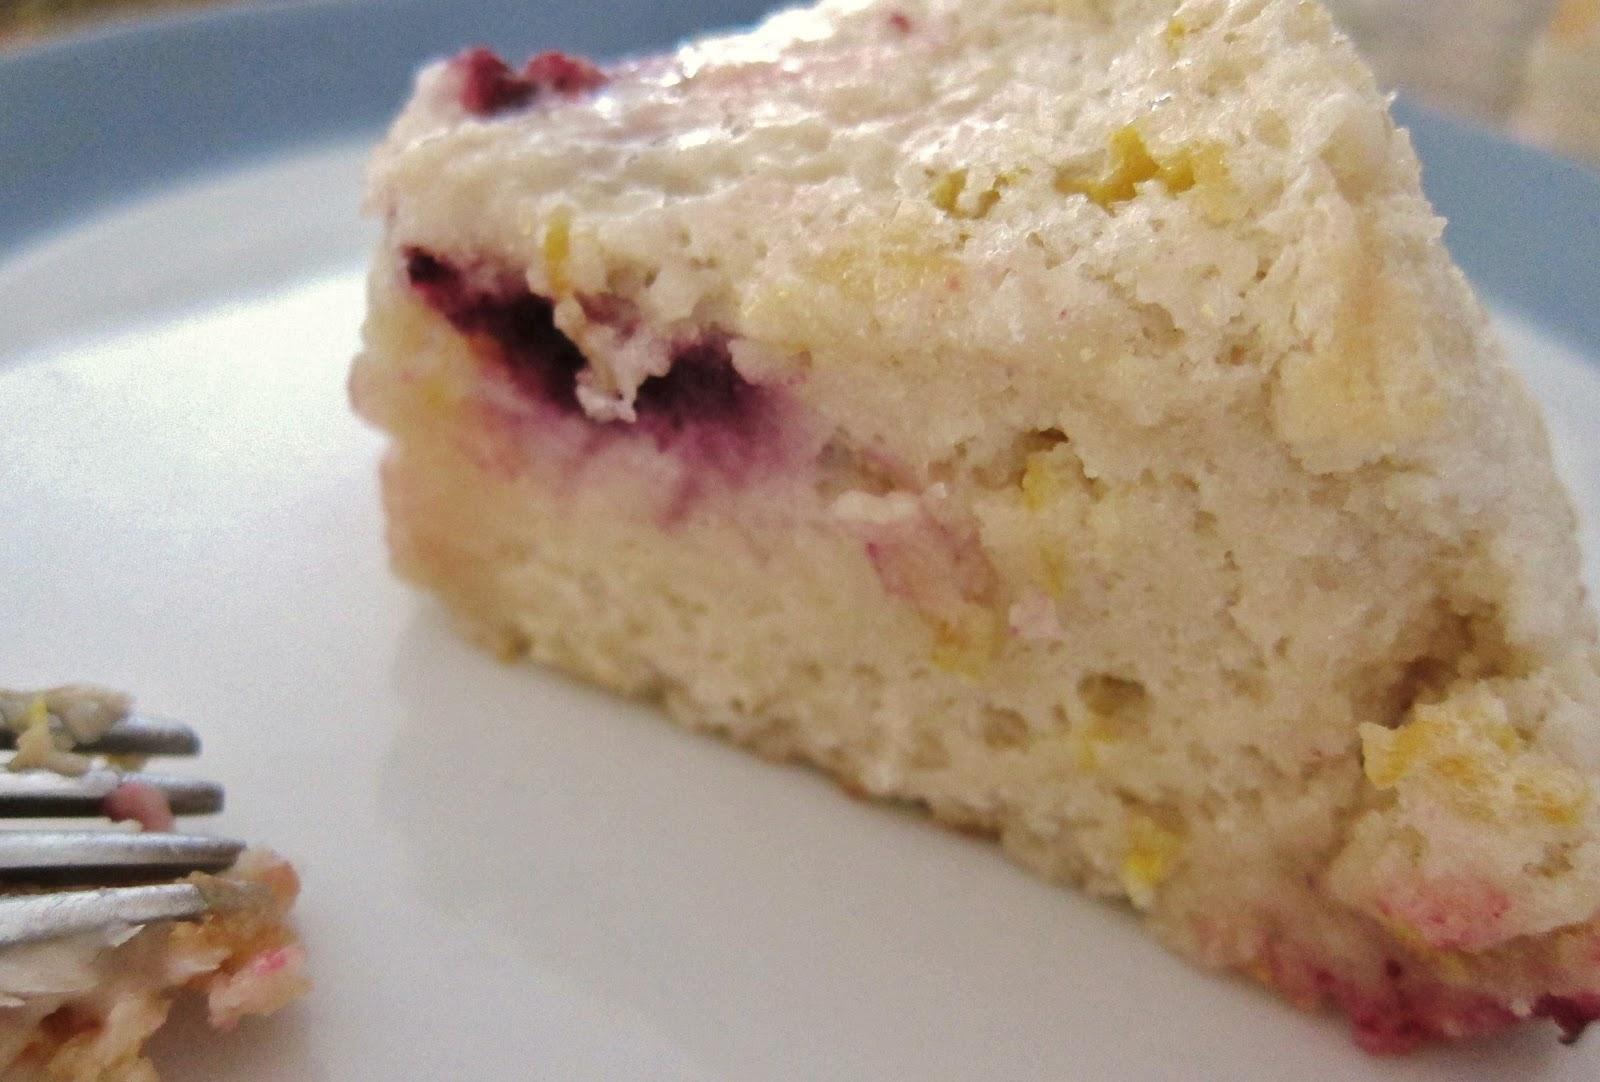 The Vegan Chronicle: Blueberry Angel Food Cake